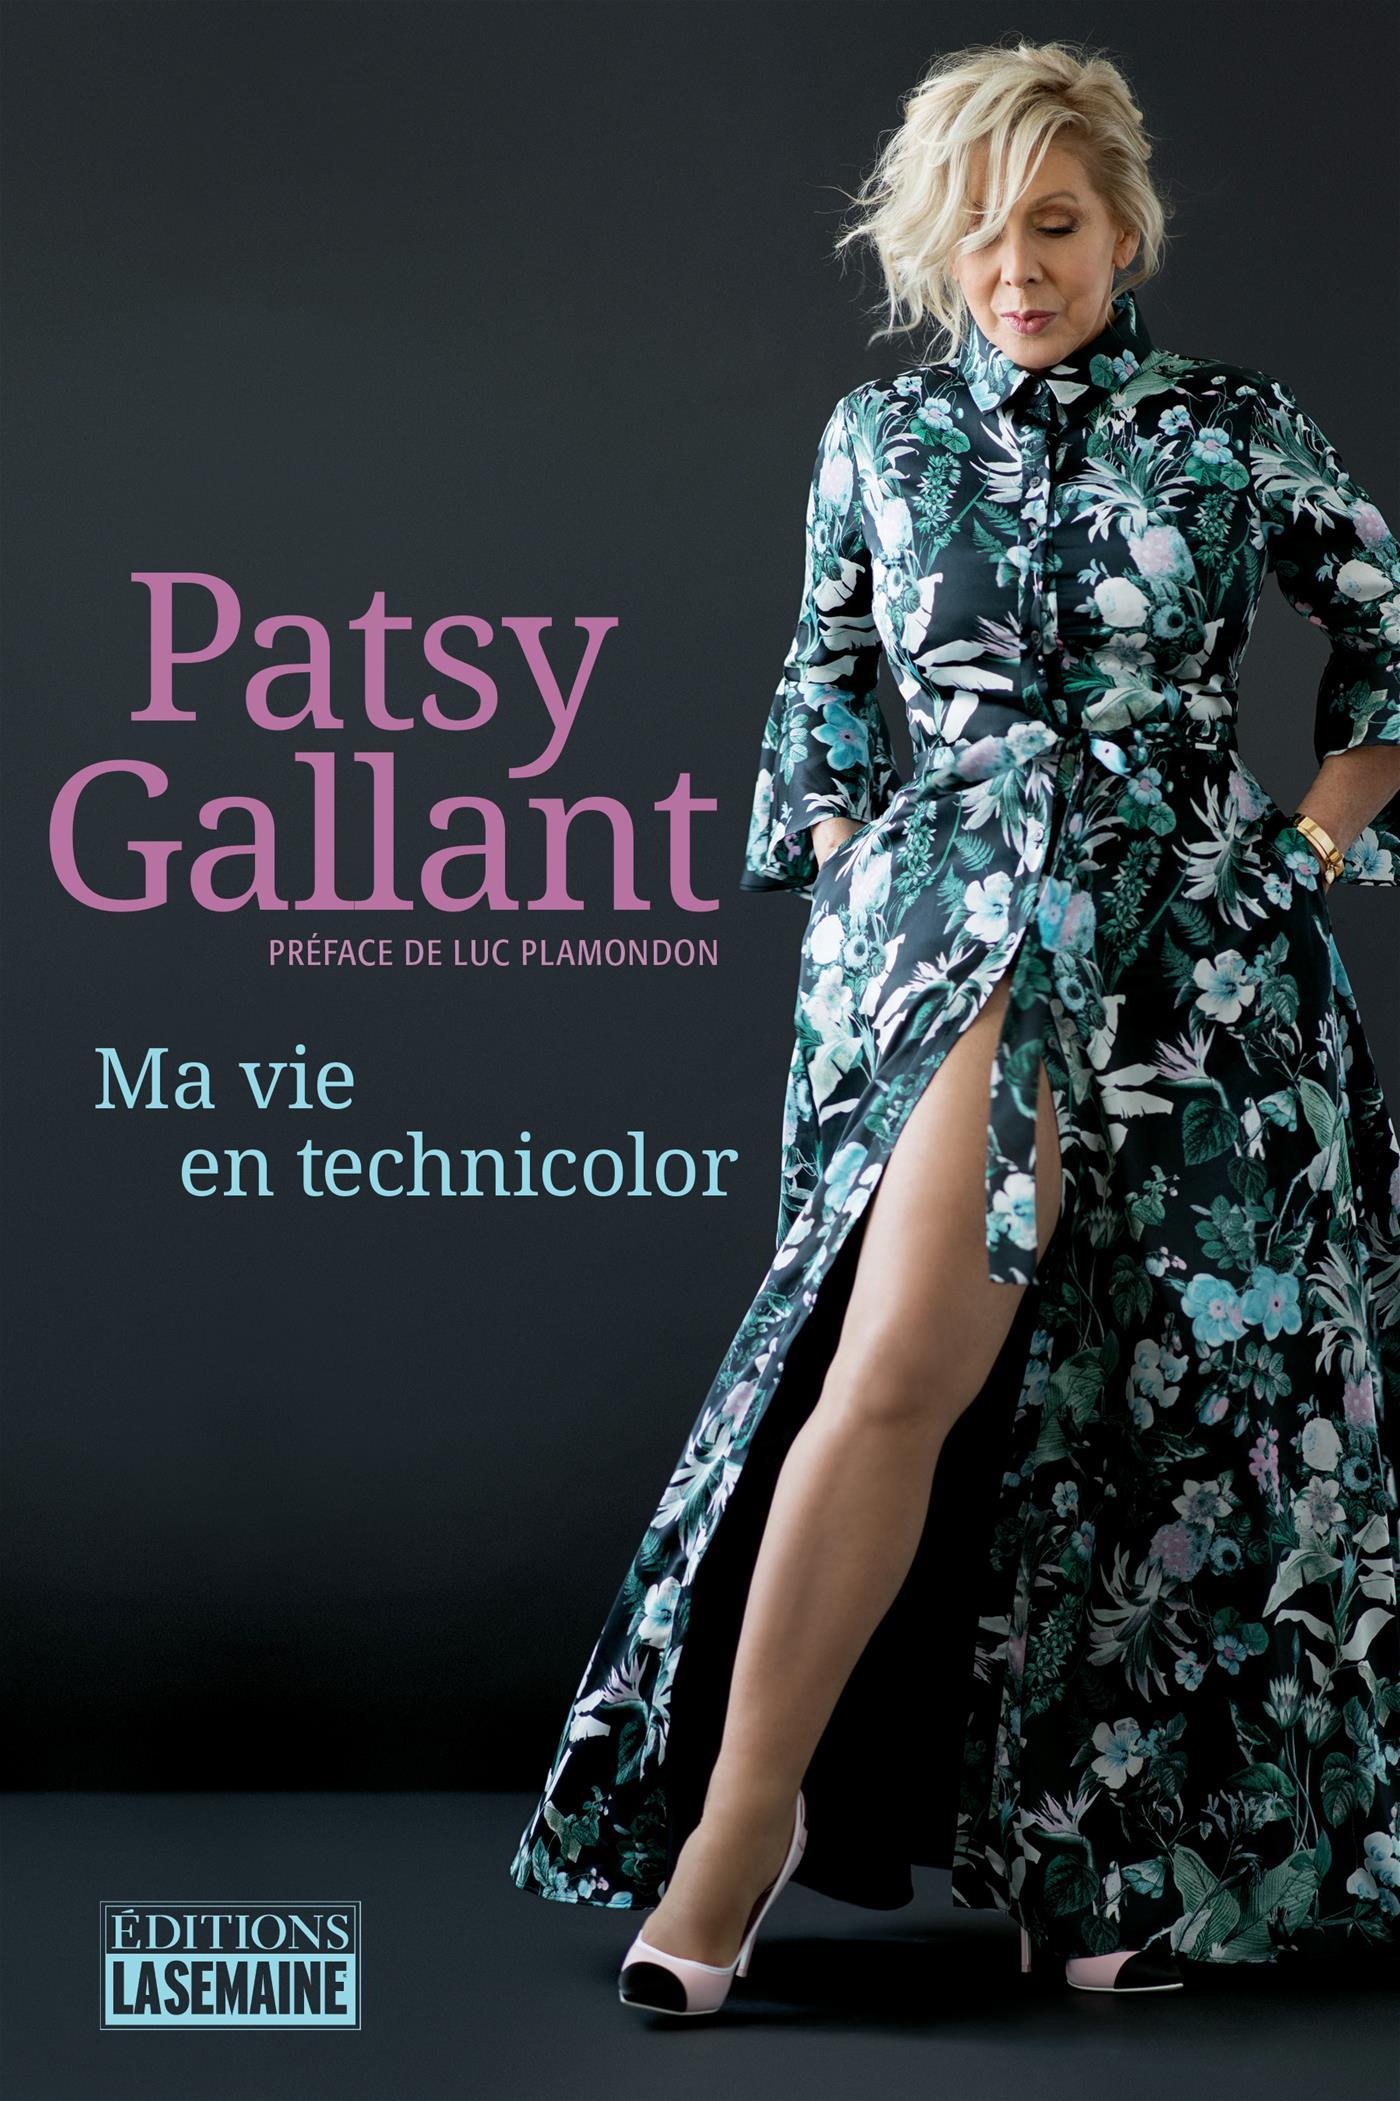 Cover image (Ma vie en technicolor)